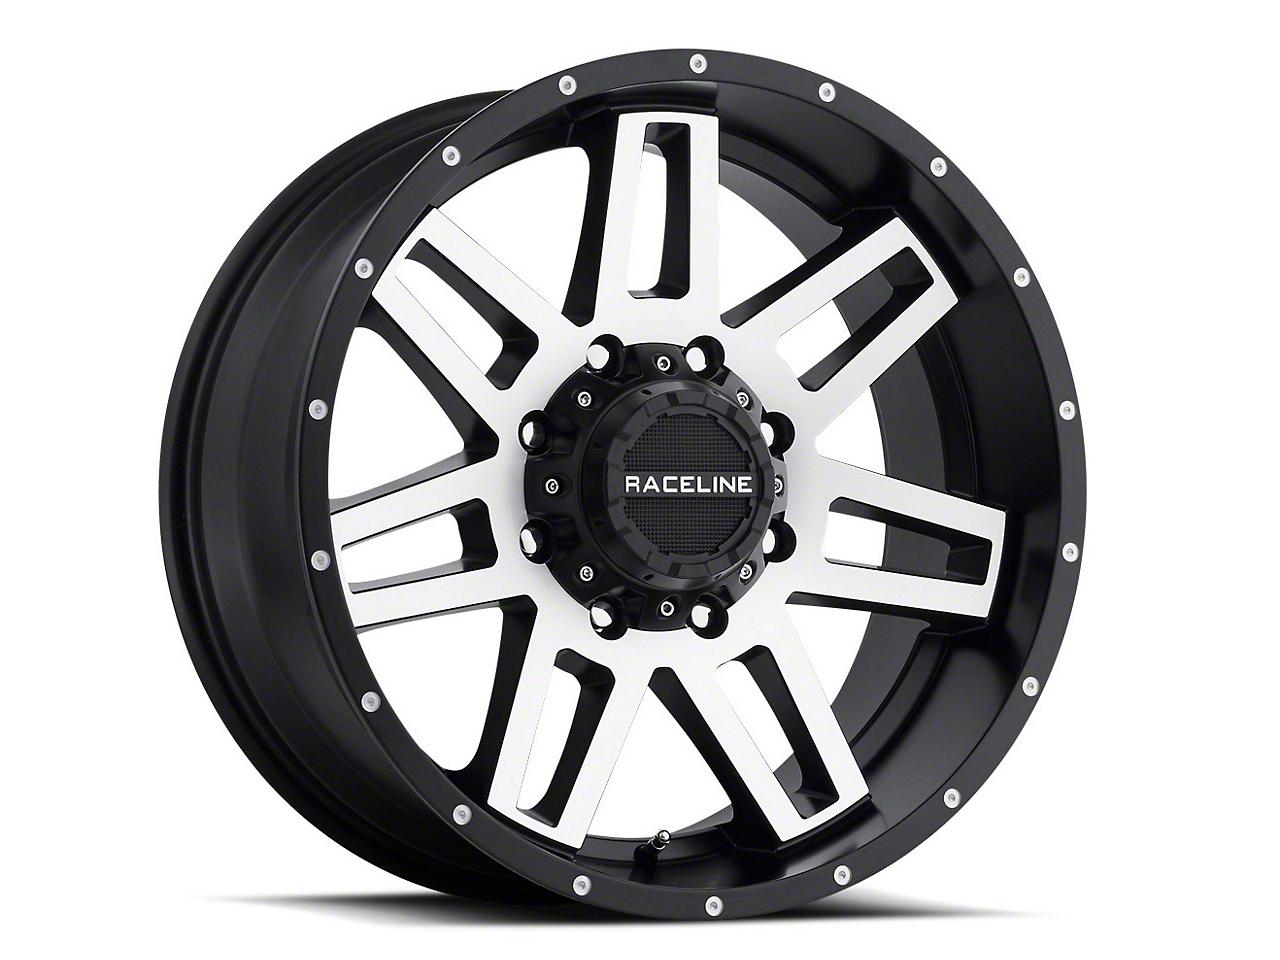 Raceline Injector Black Machined 6-Lug Wheel - 17x9 (07-18 Sierra 1500)